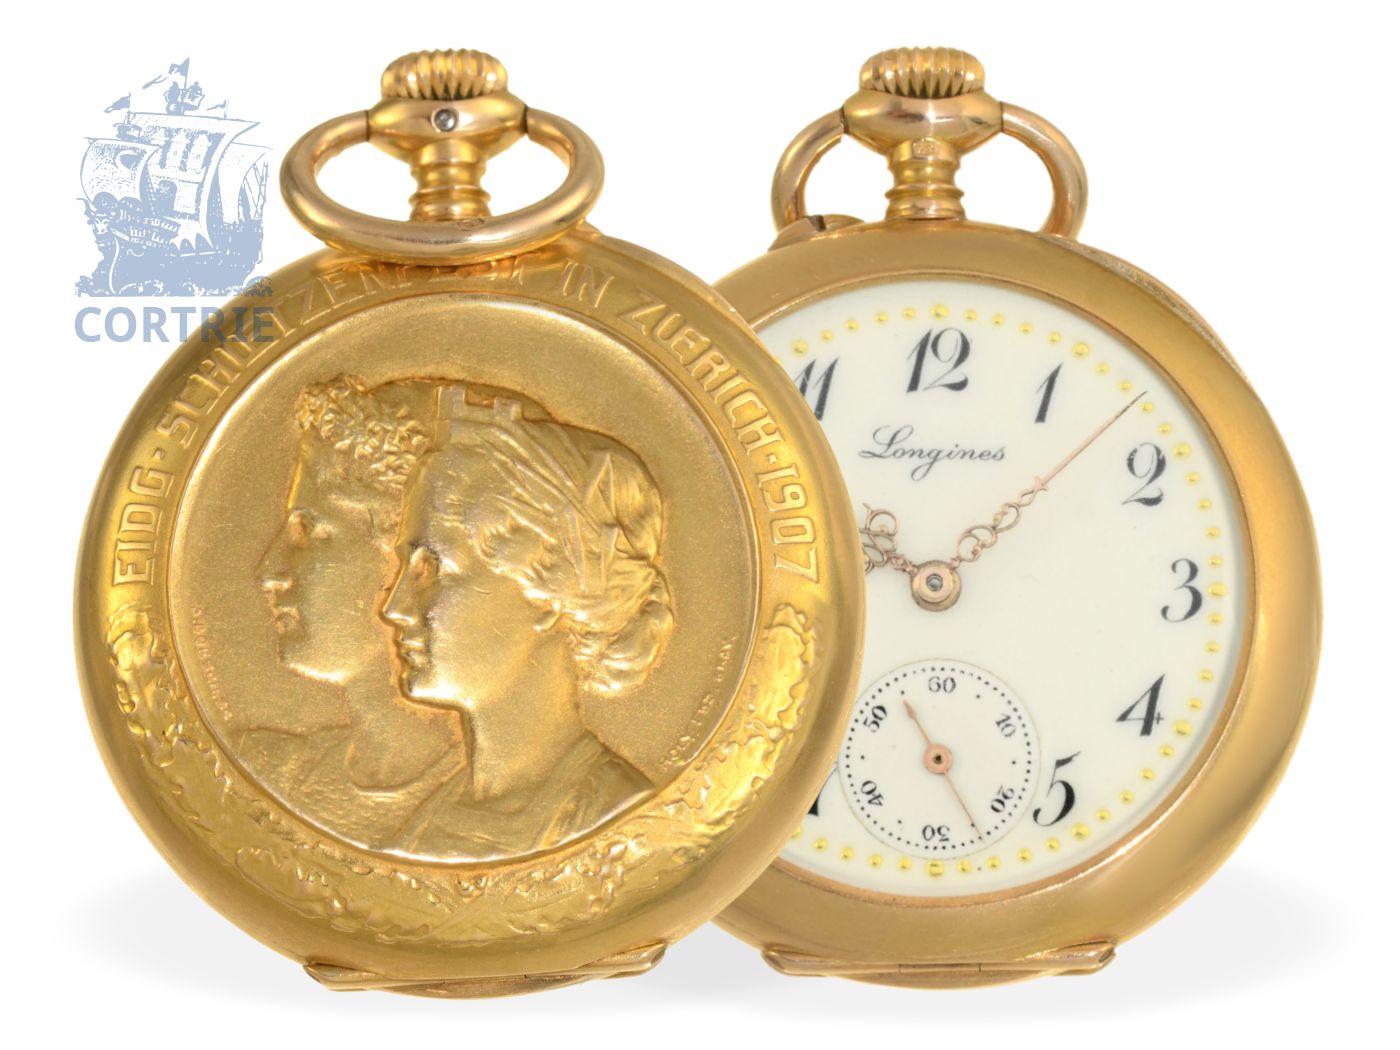 Pocket watch: very rare 18K marksmen watch Tir Federal, Zurich 1907, Longines 1907, rarity-